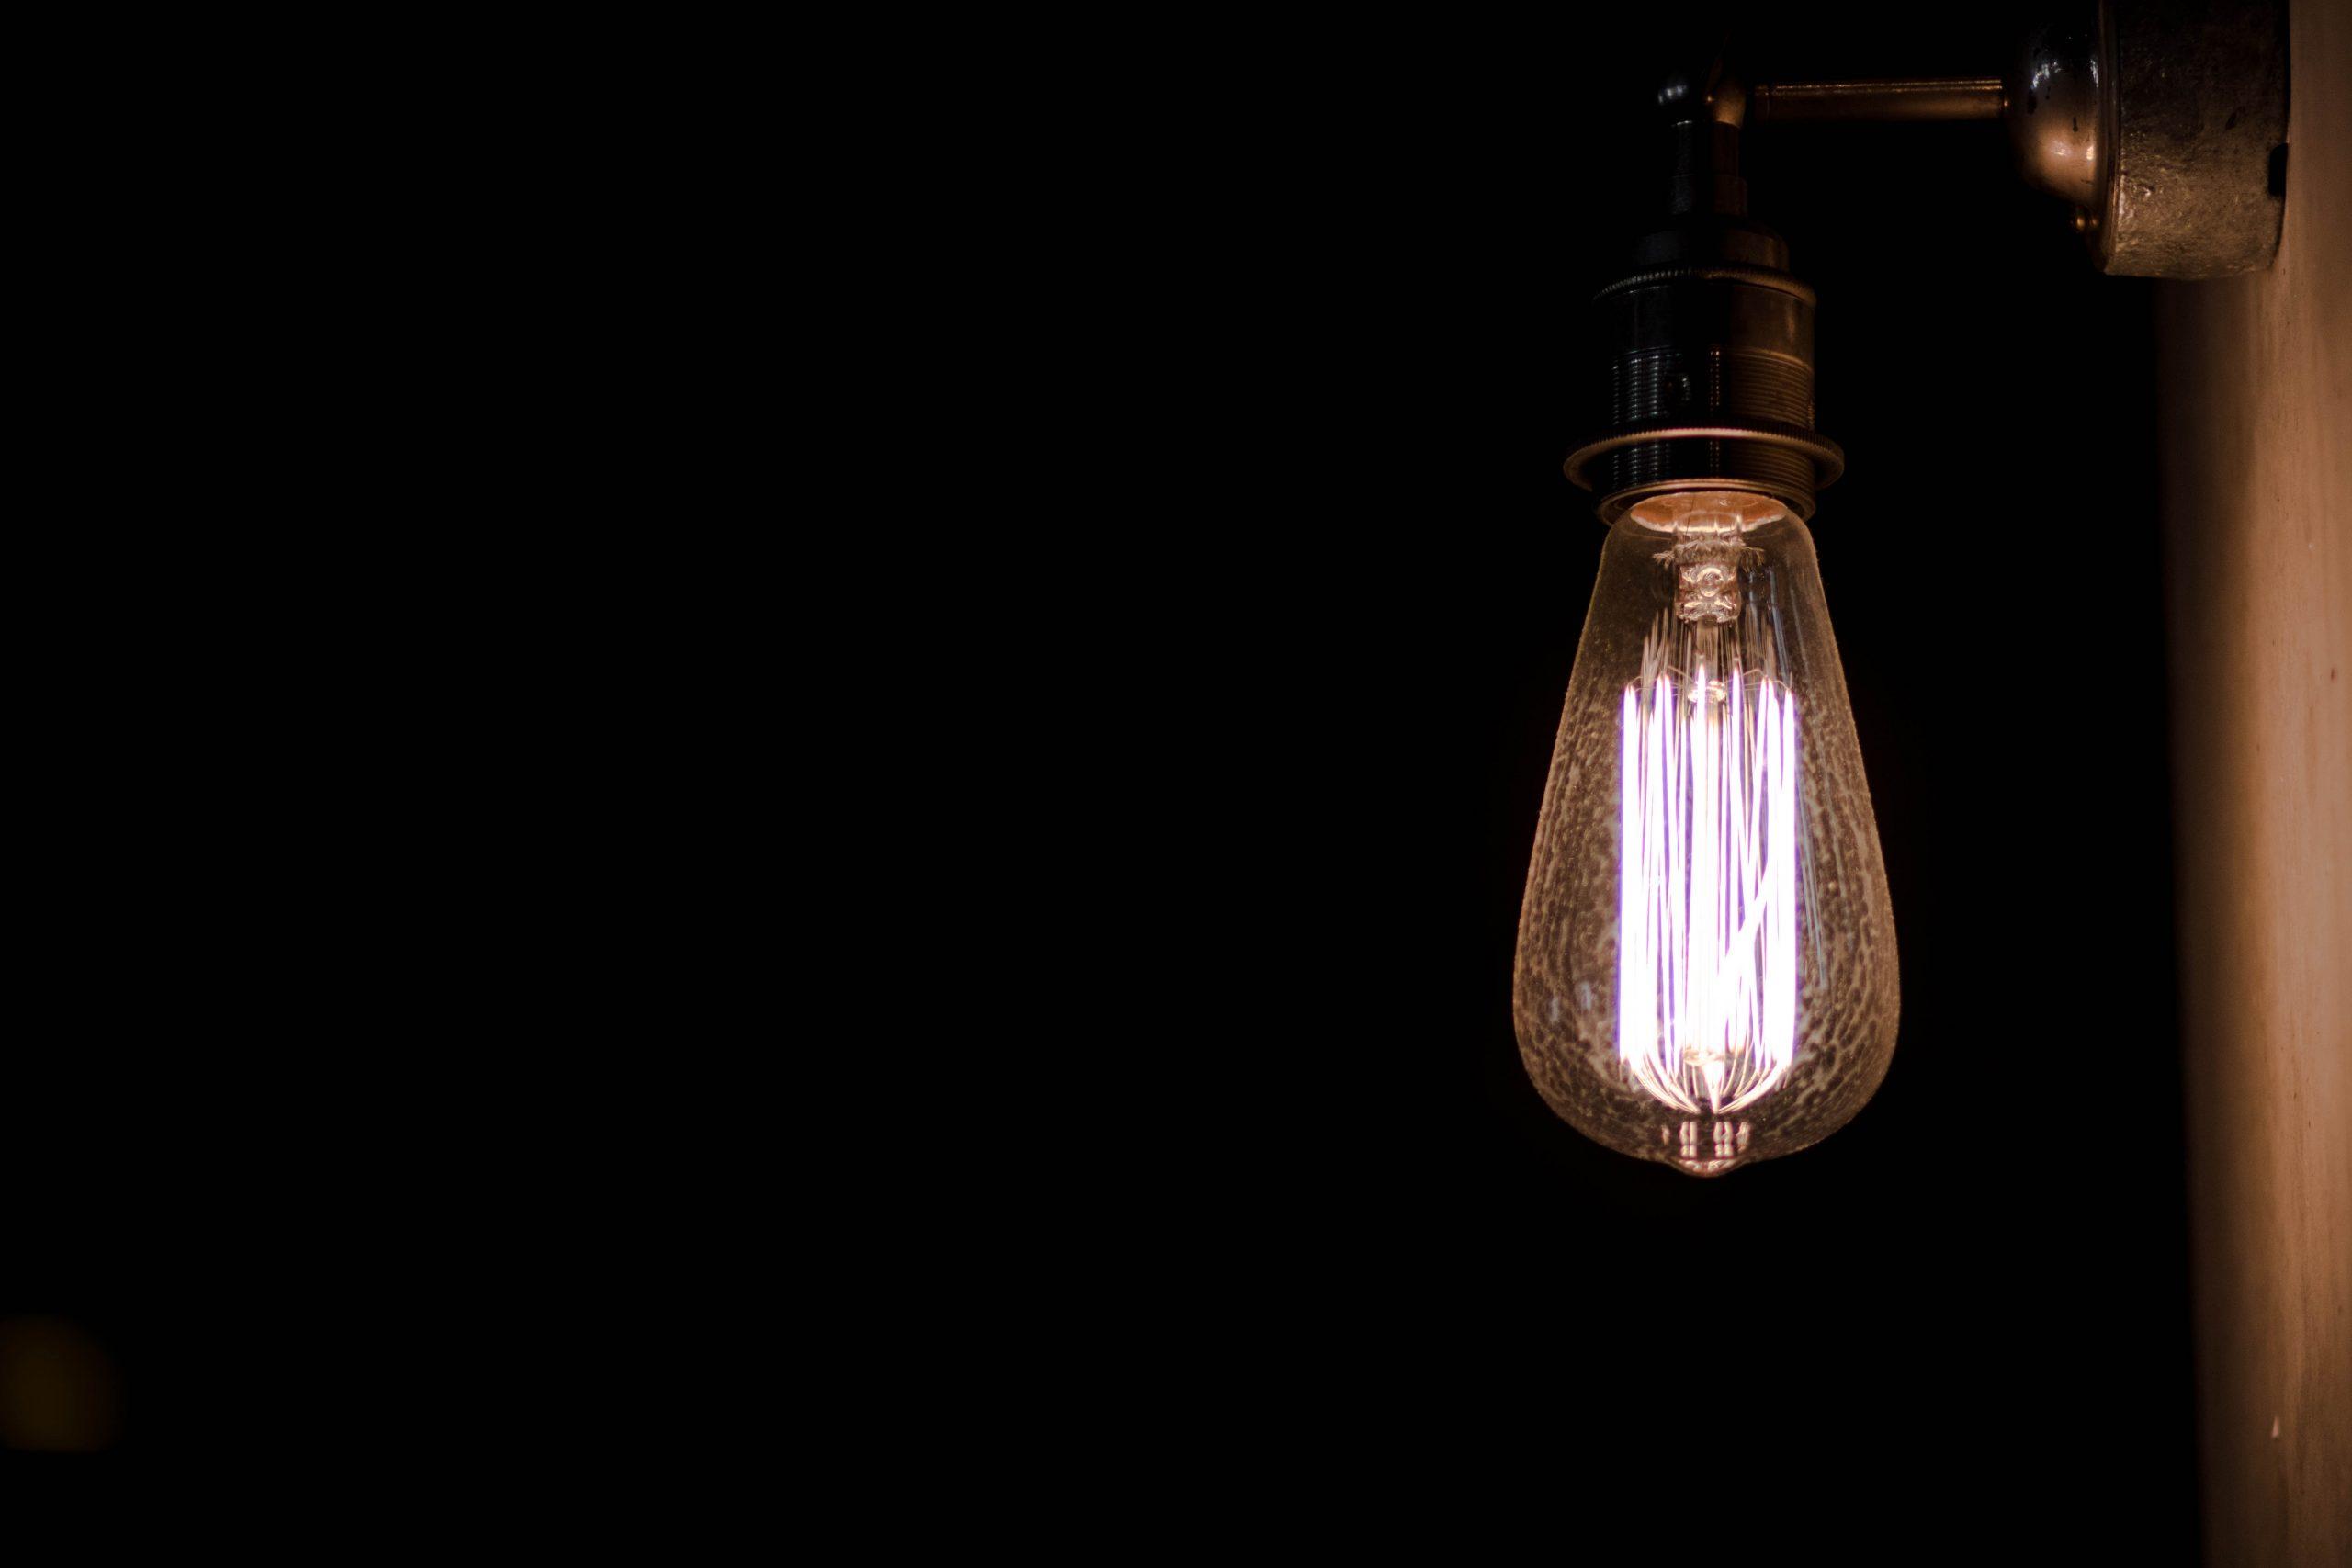 callum shaw bECXV0LLW5c unsplash scaled - Belysning påvirker stemningen og atmosfæren